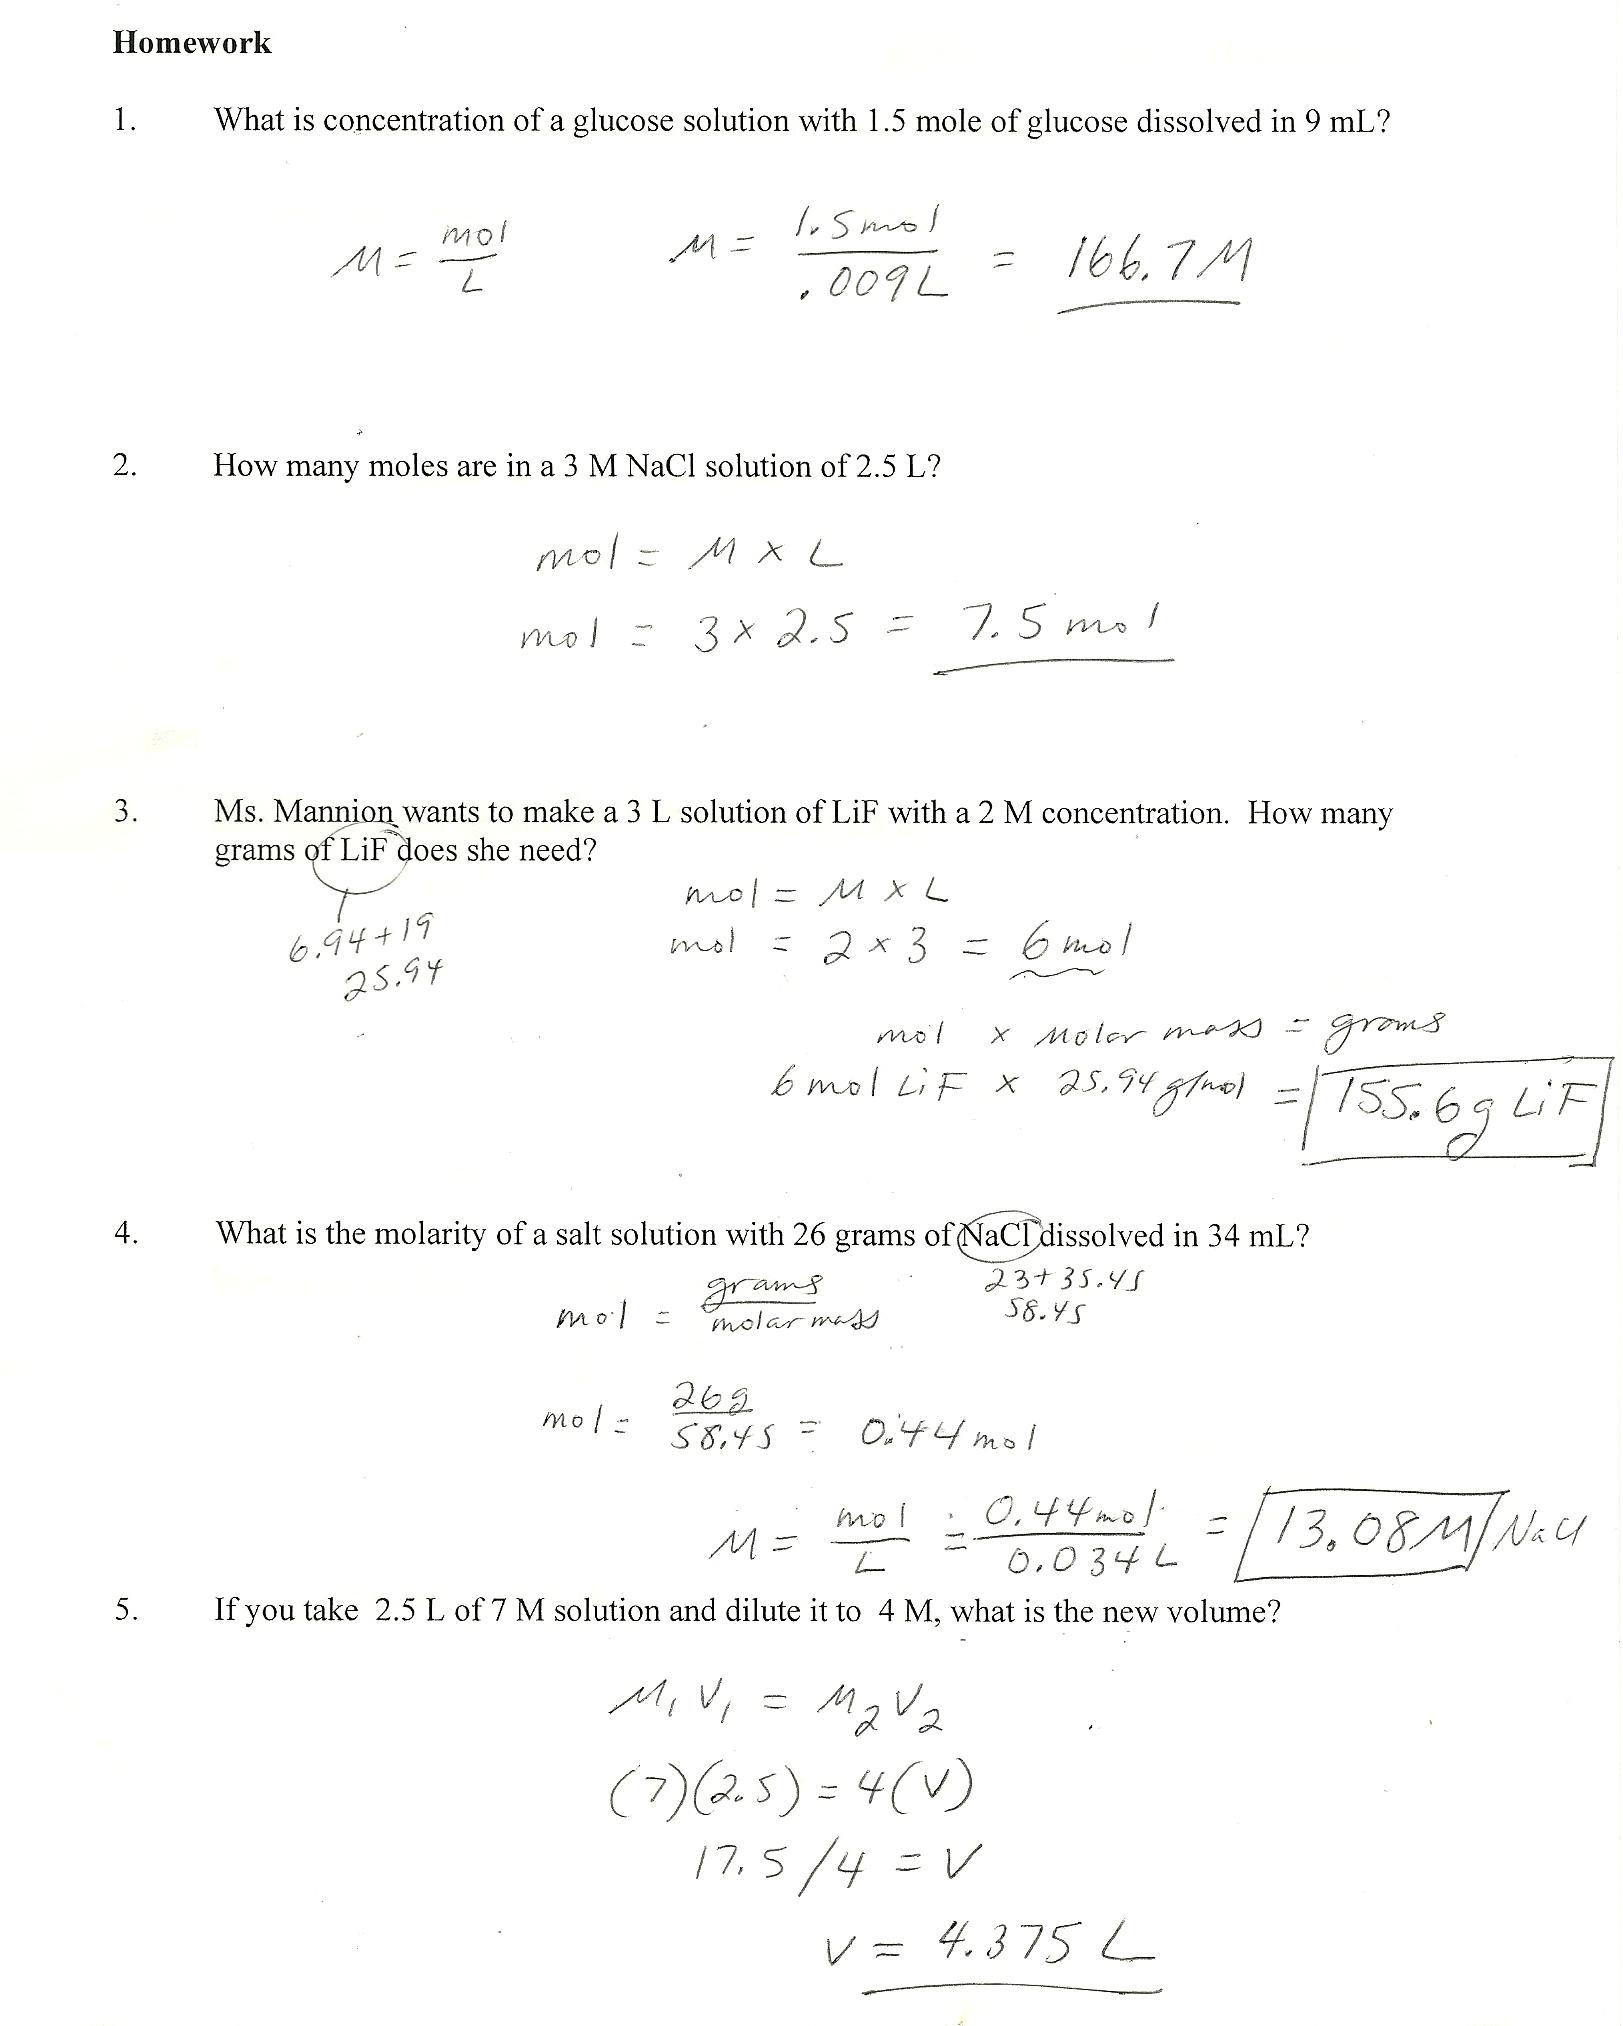 Homework Help - CREDO ToolBox - Credo Reference